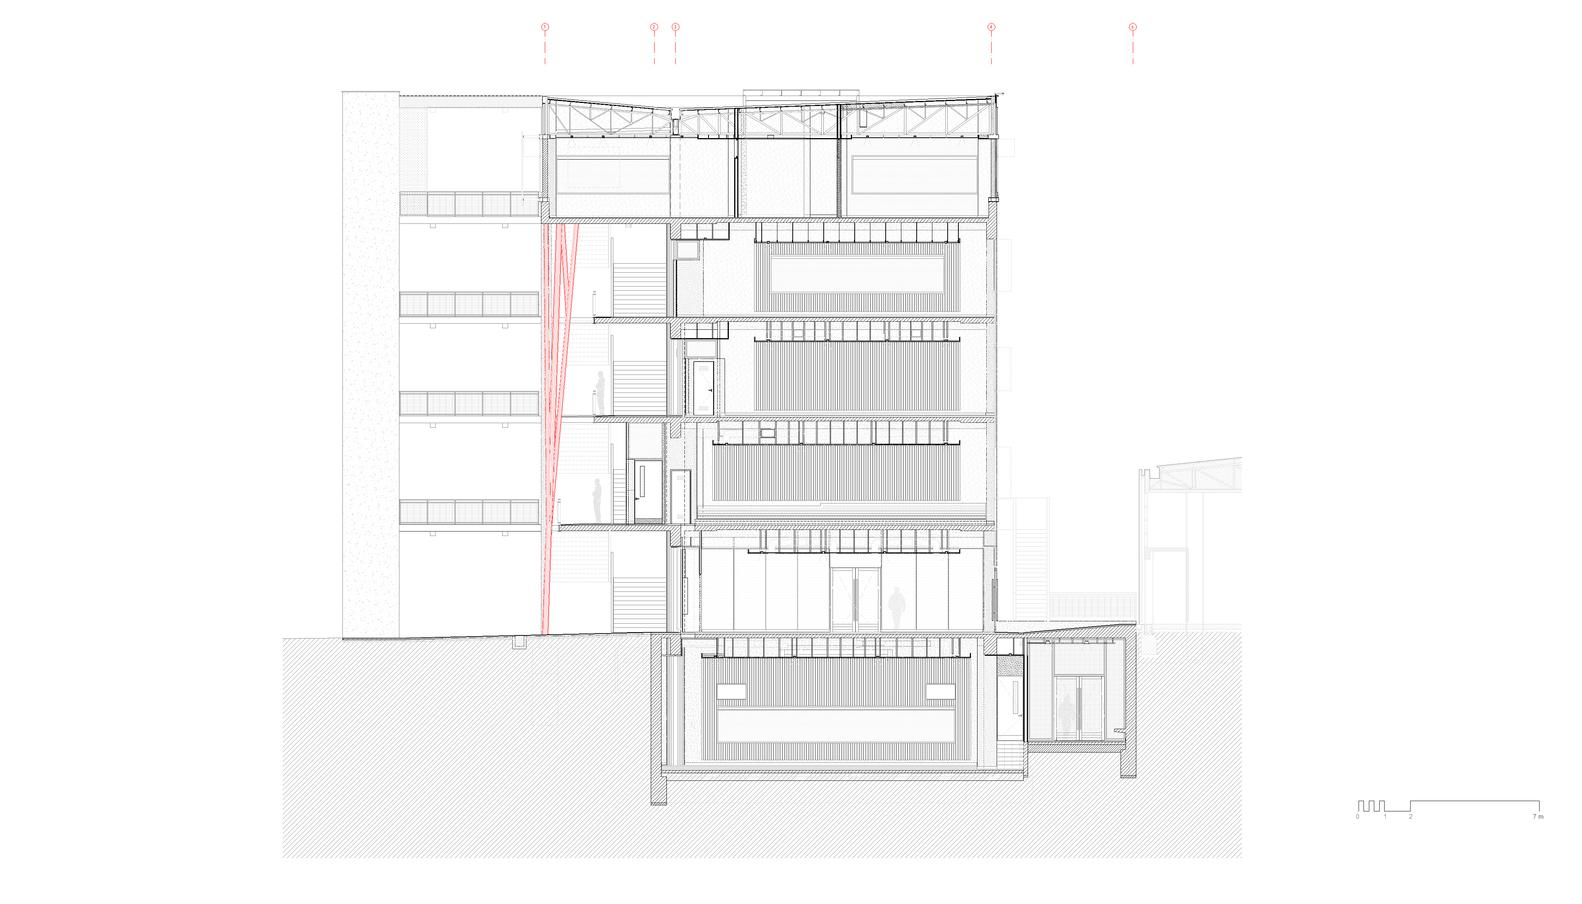 hight resolution of edificio de aulas corte aa